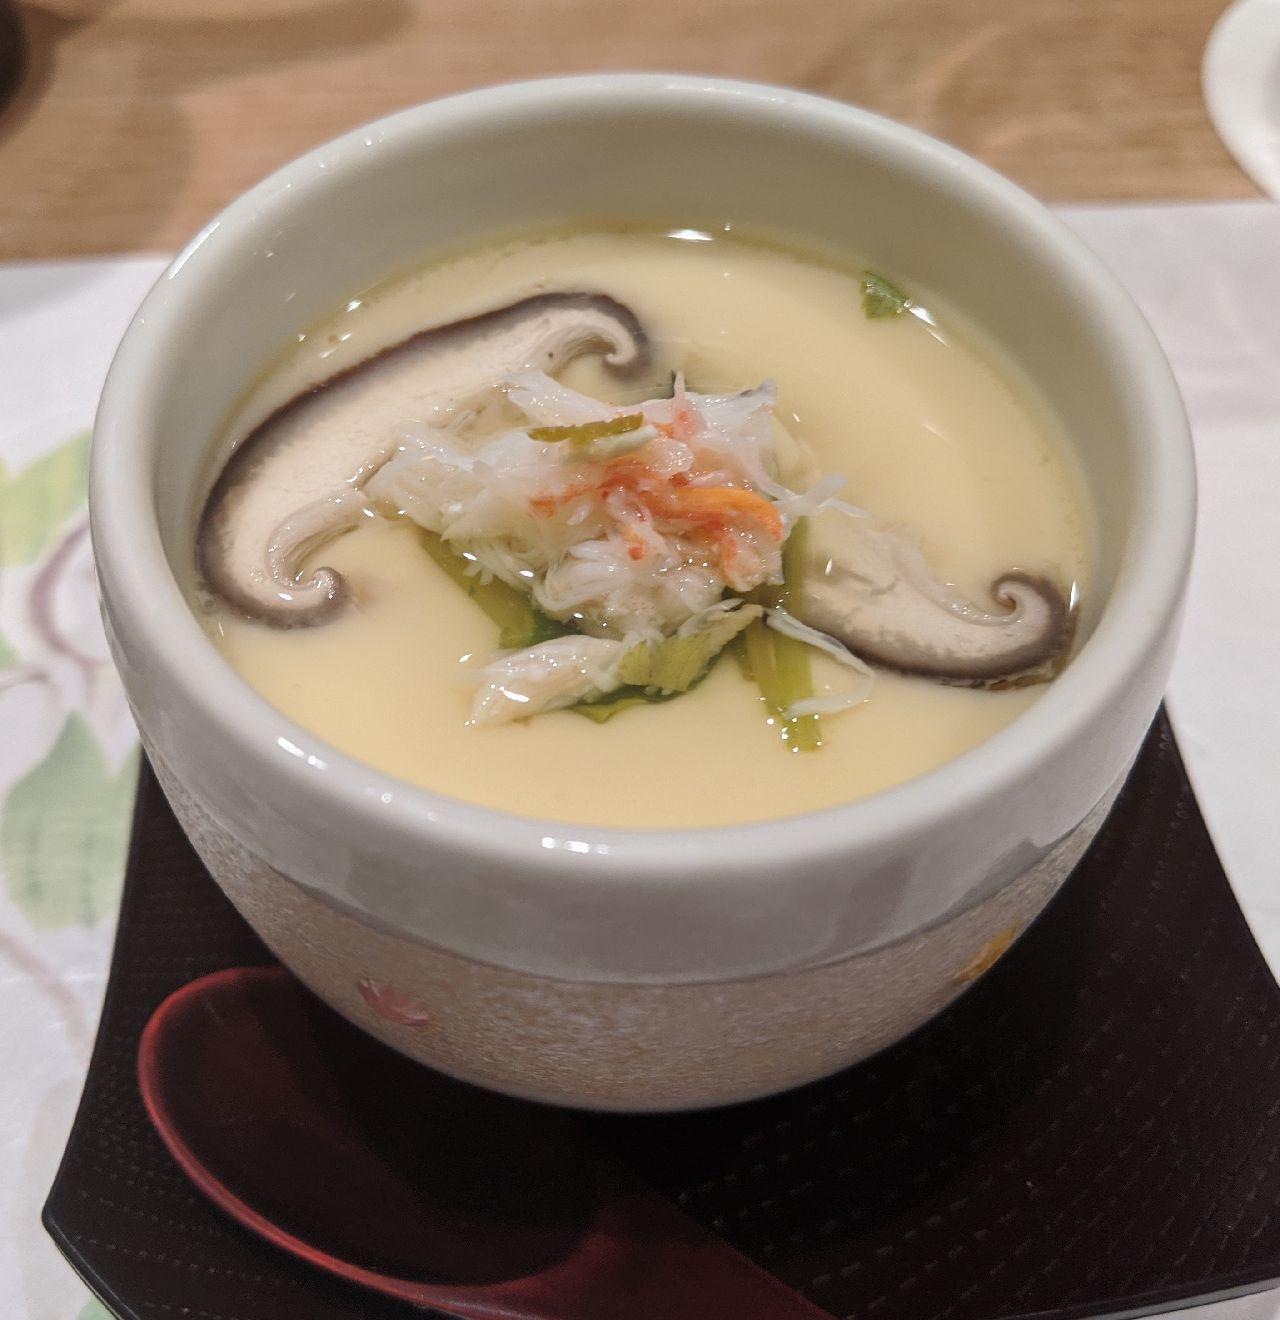 MVIMG_20200605_184018海鮮茶碗蒸し